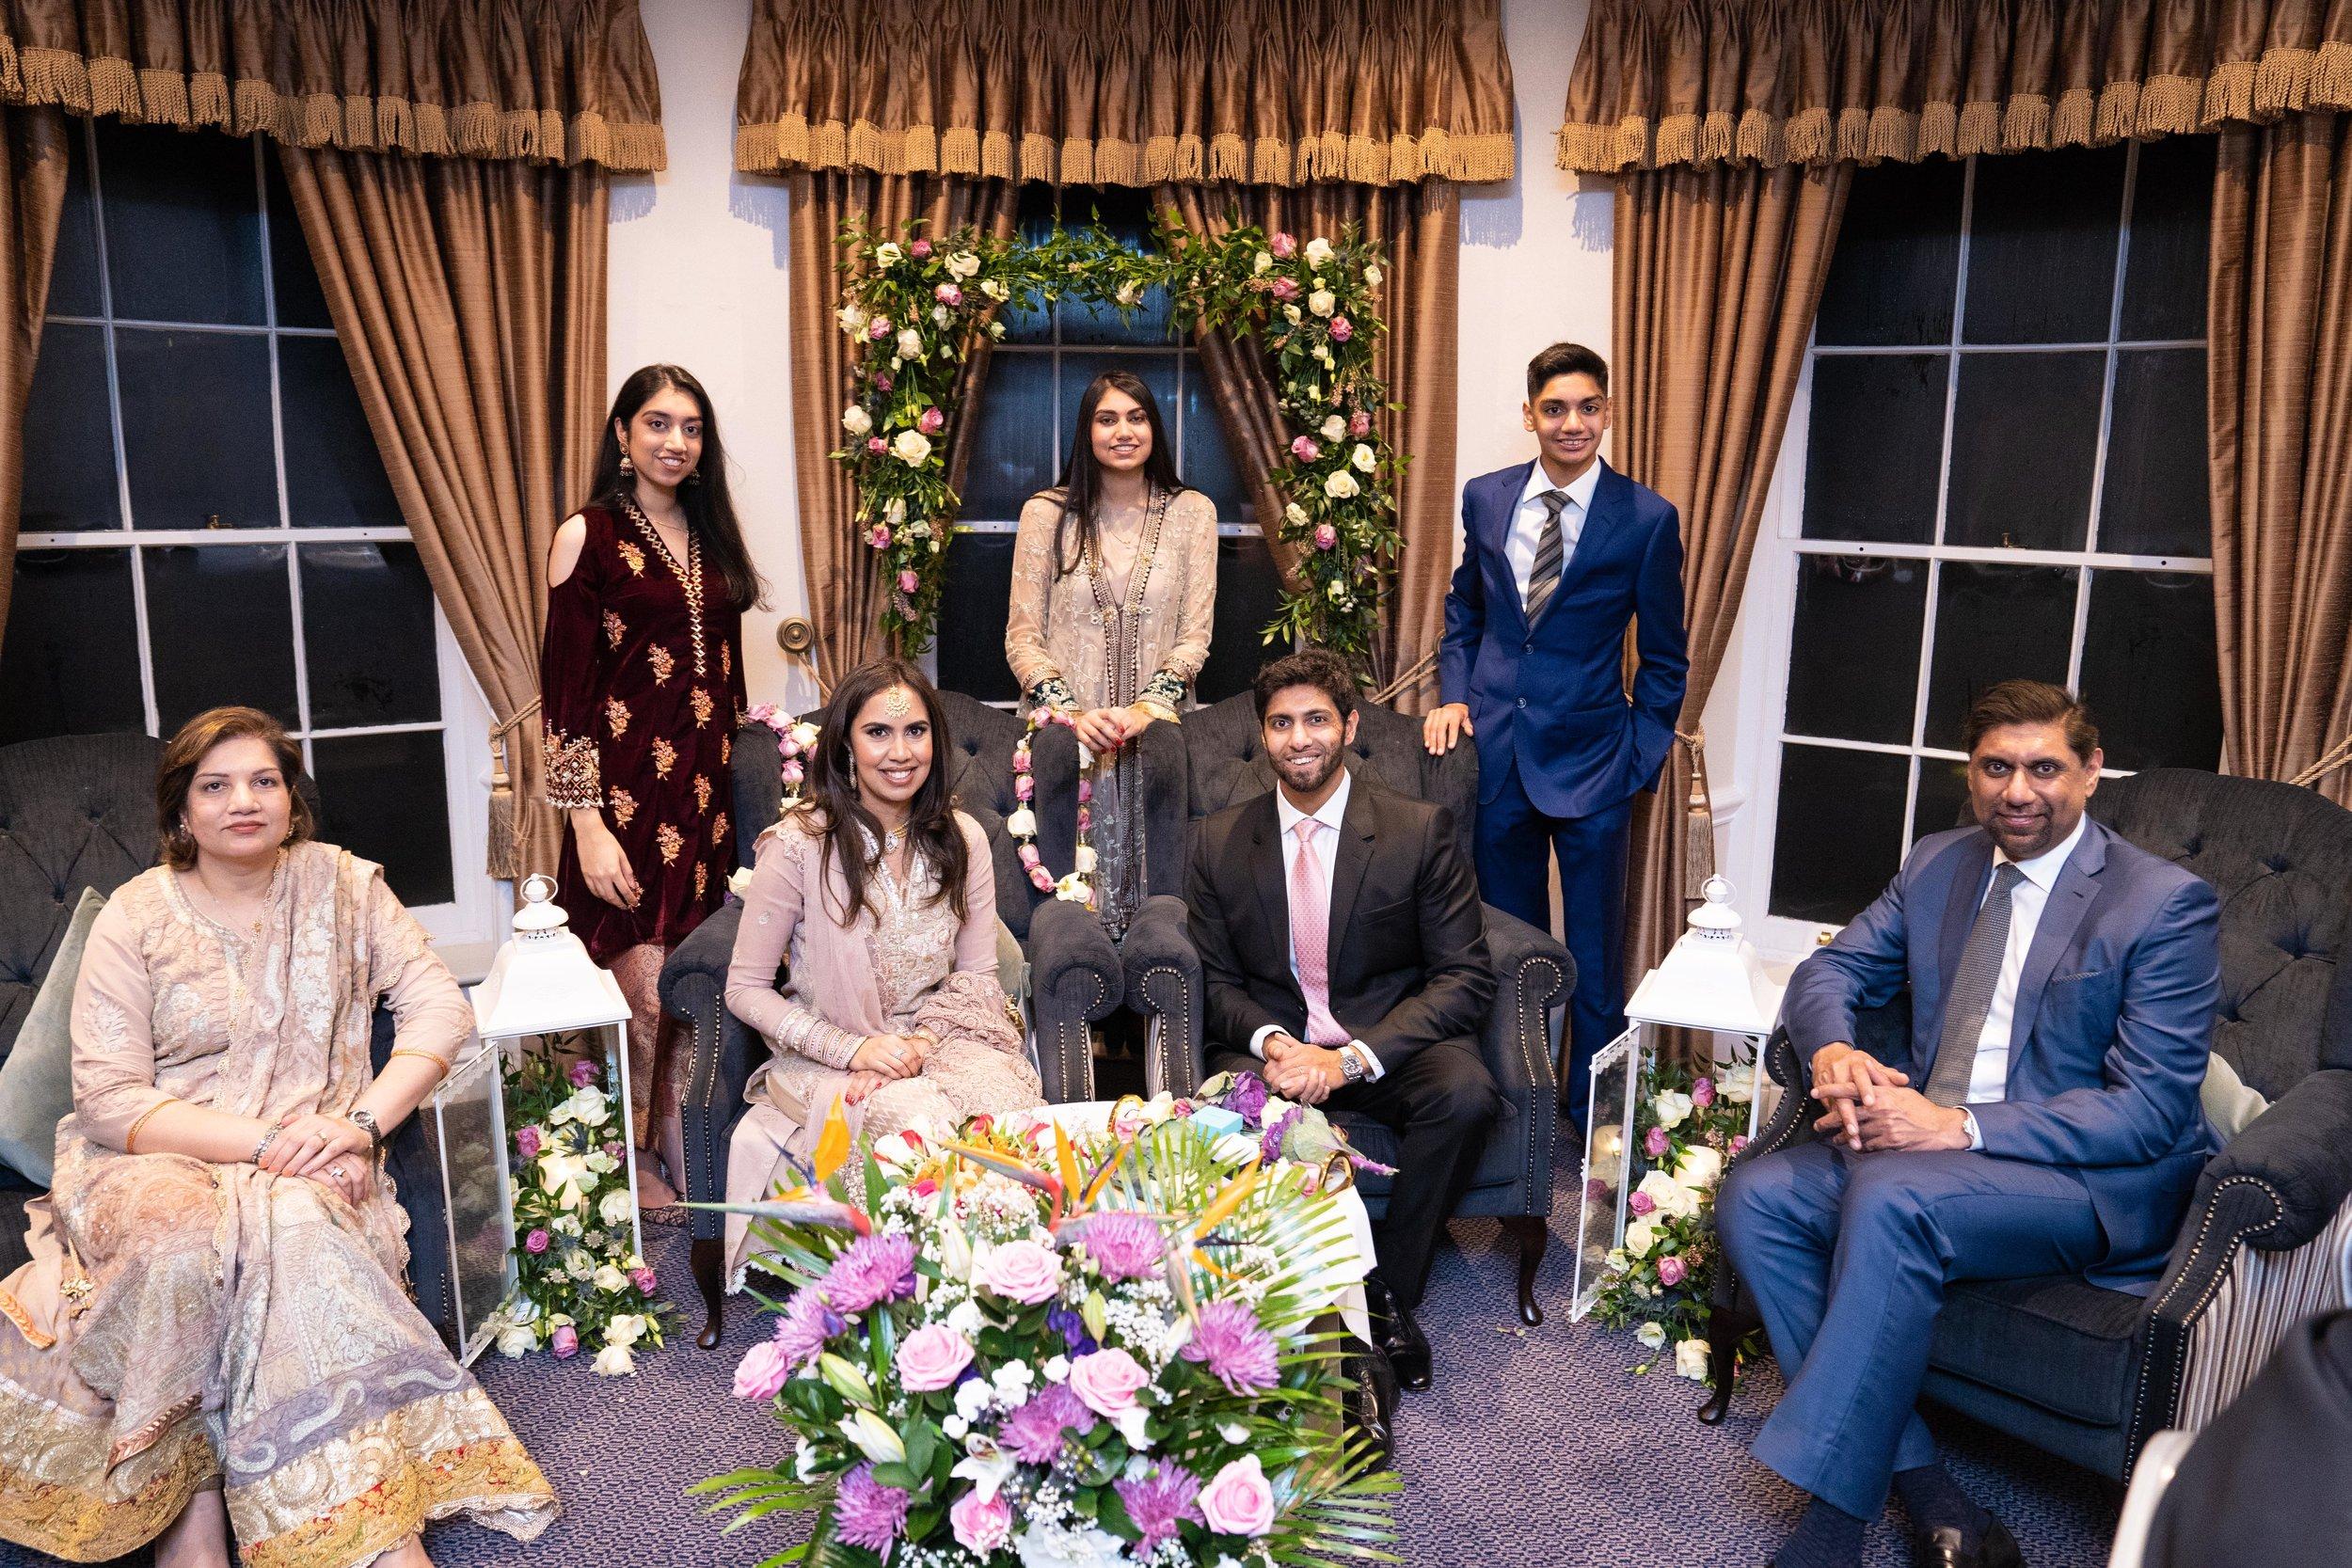 buckinghamshire-golf-club-winter-muslim-wedding-engagement-photography-videography-50